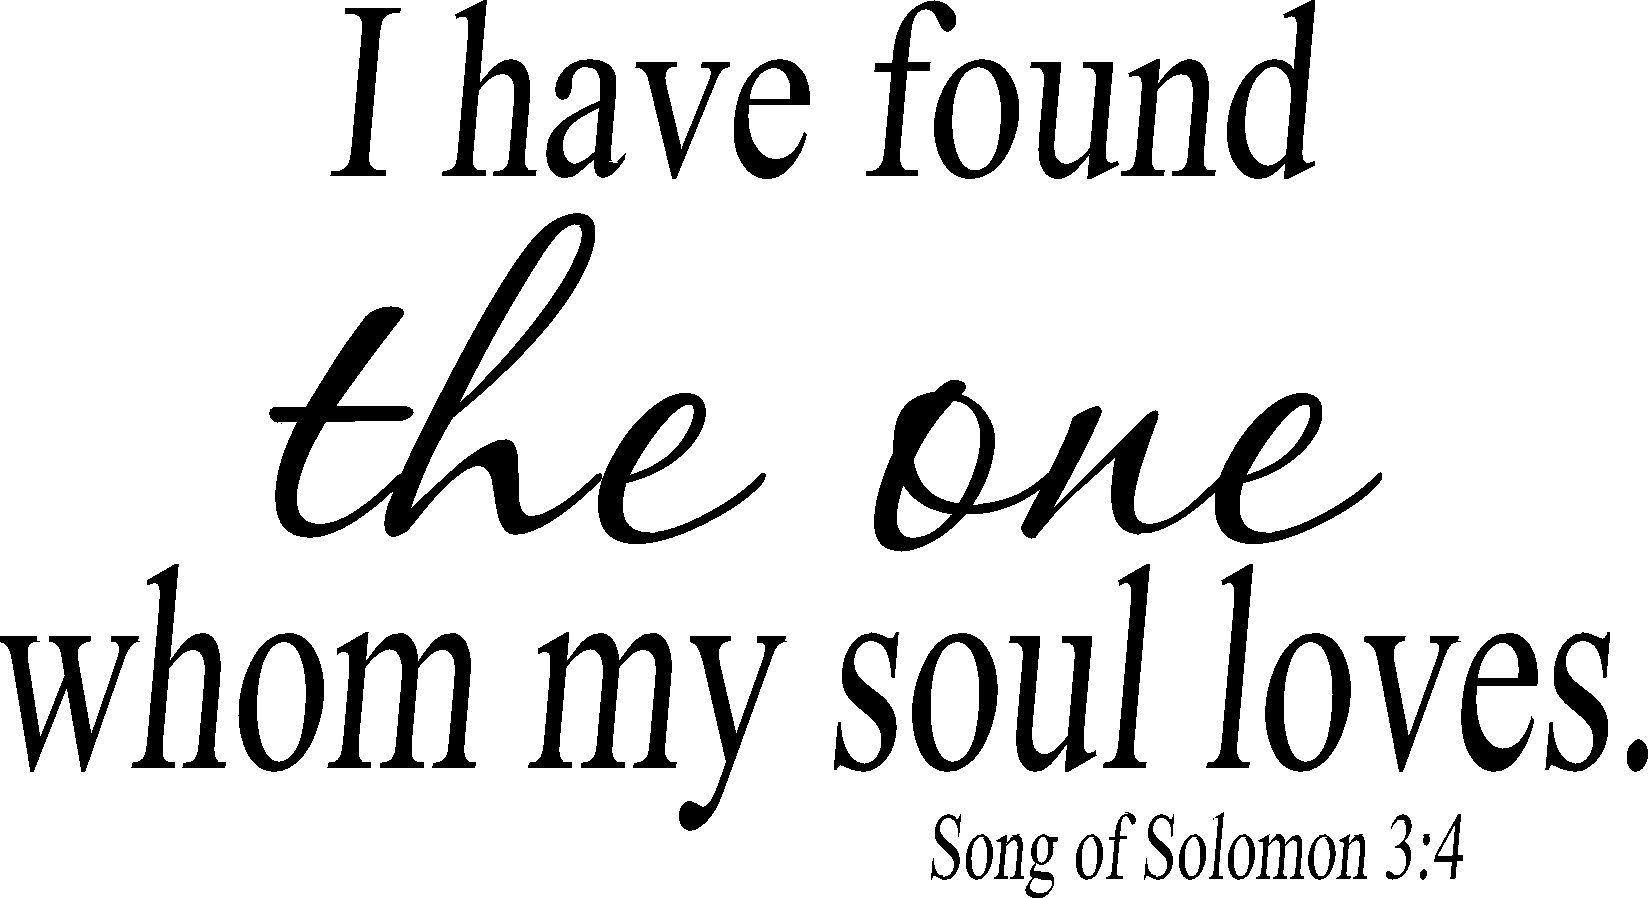 song 3 4 scripture